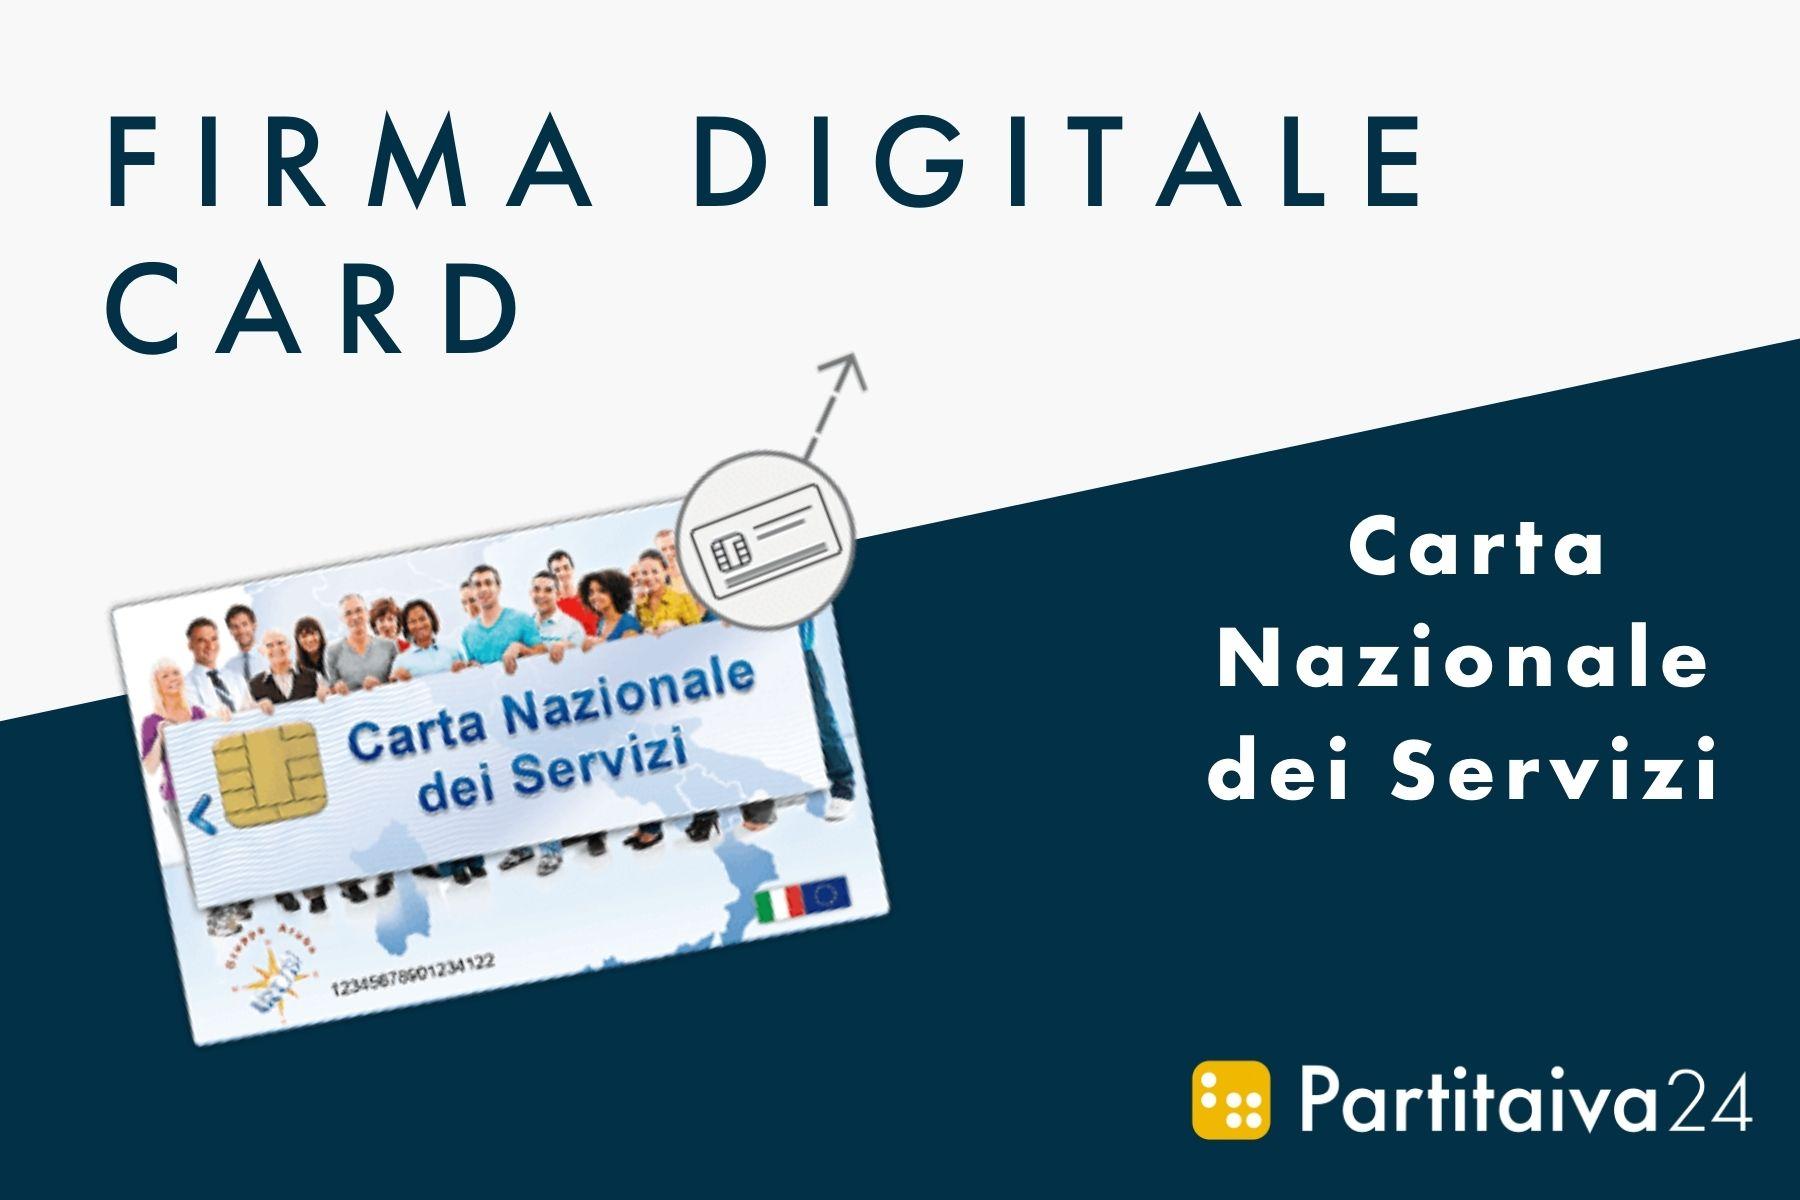 Firma digitale - smart card CNS